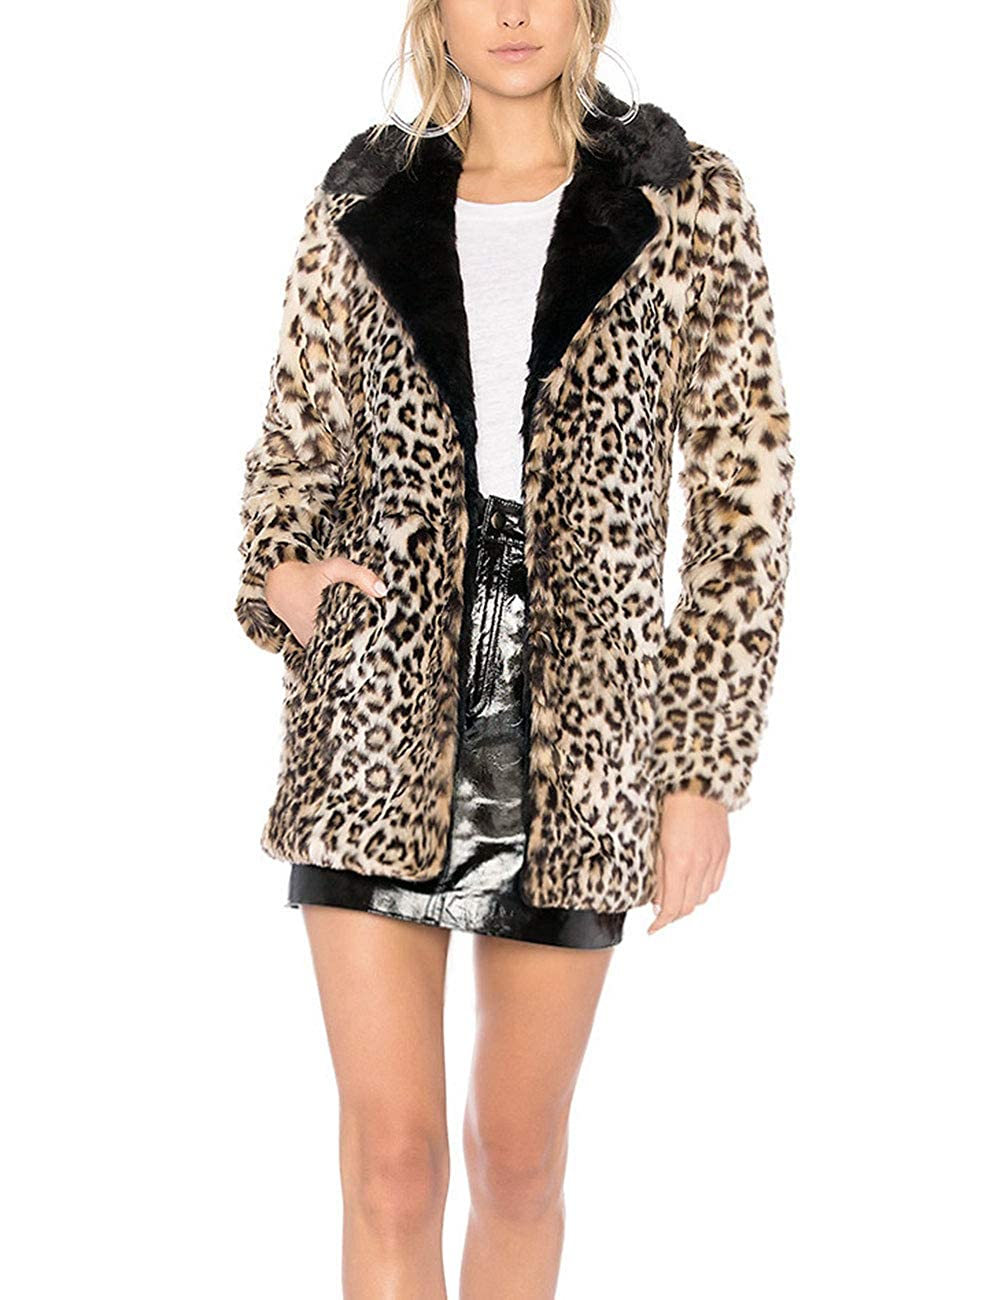 ZLSLZ Womens Ladies Winter Faux Fur Slim Leopard Furry Mid Length Parka Jacket Coat